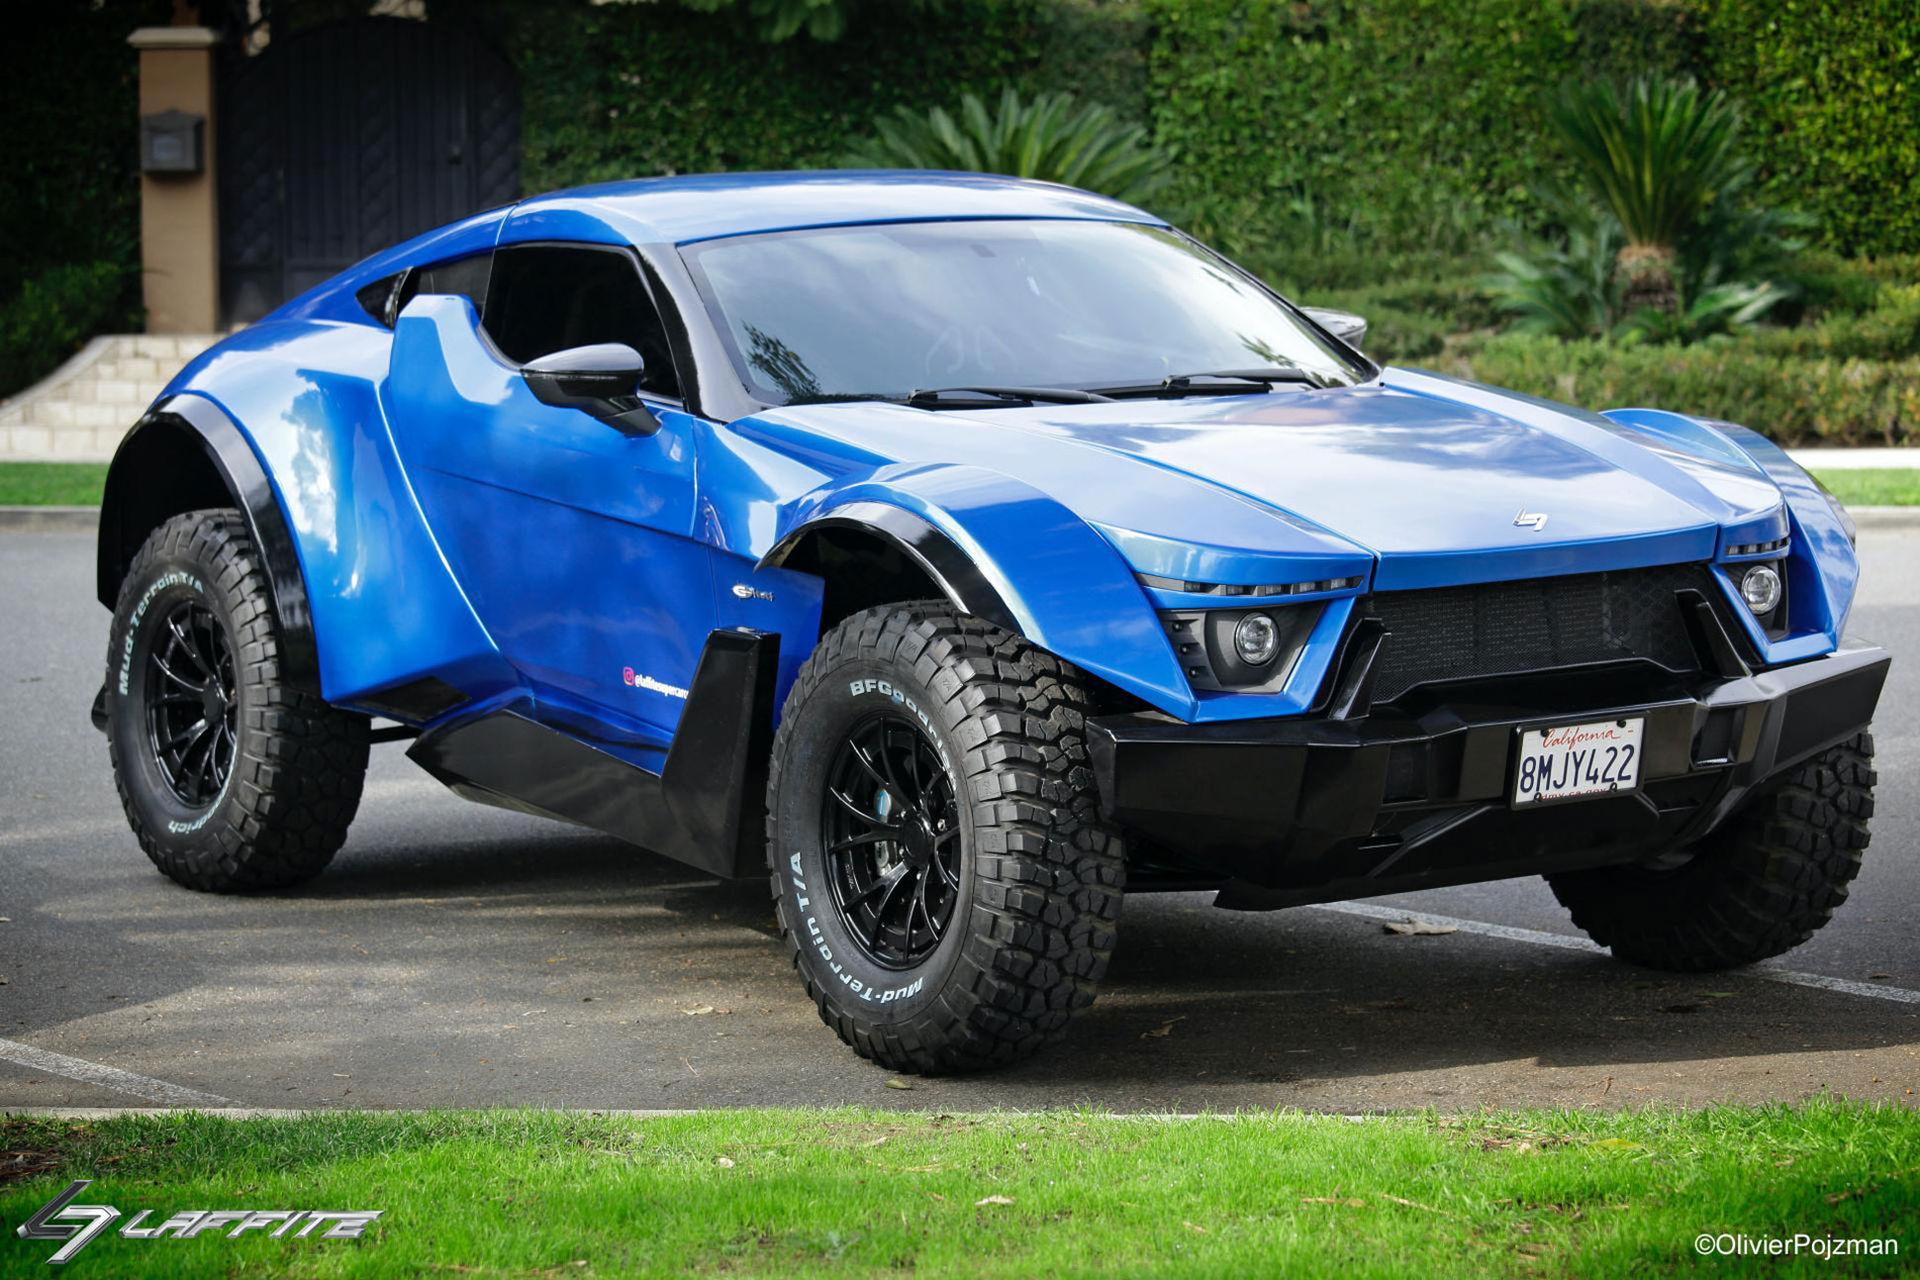 Laffite G-Tec X-Road - superbil som ska klara tuff terräng